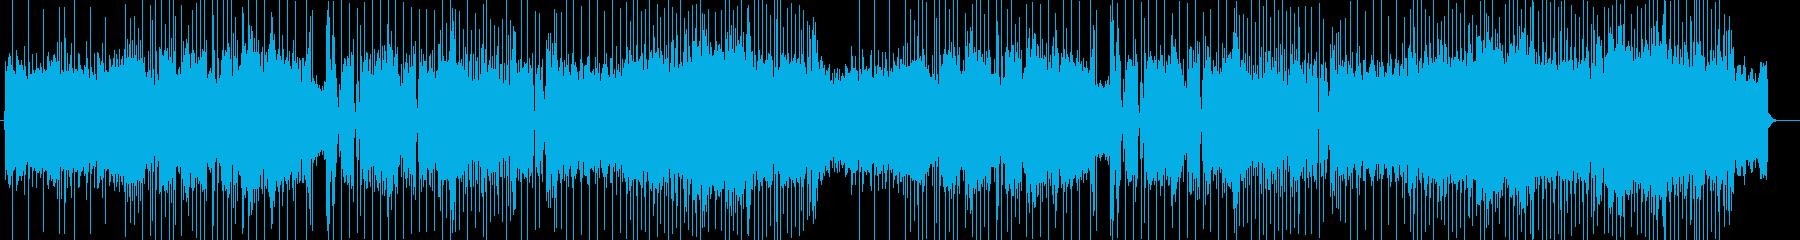 「HR/HM」「ROCK」BGM274の再生済みの波形